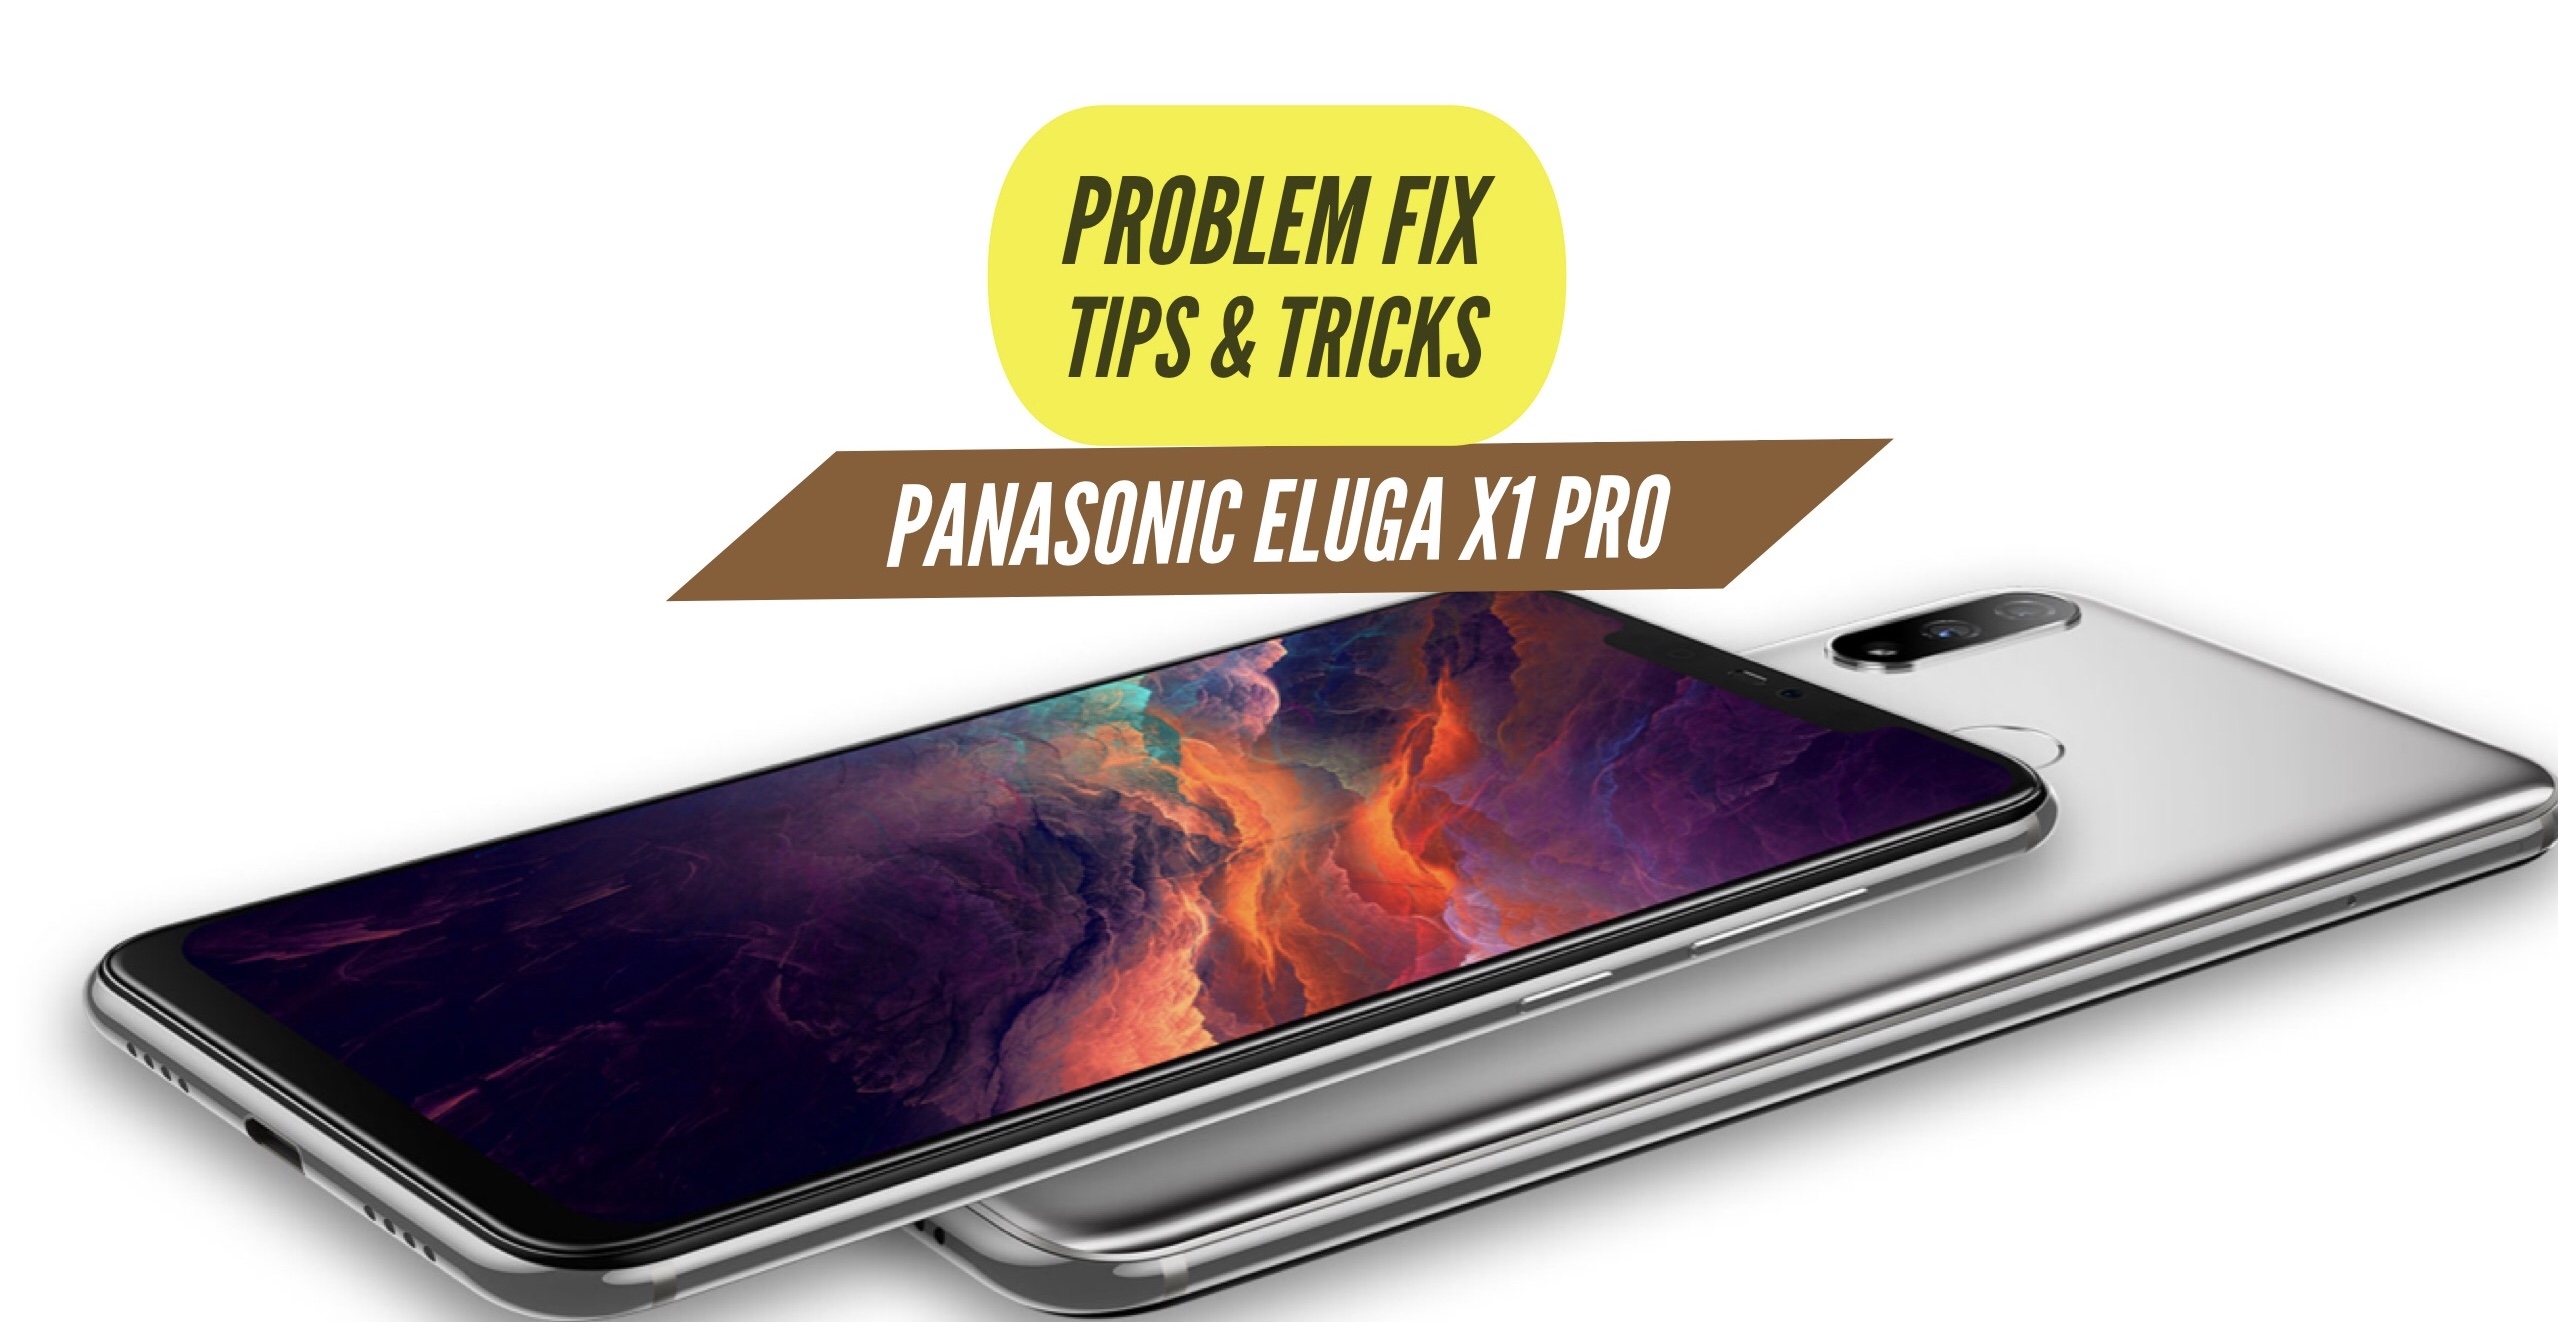 Panasonic Eluga X1 Pro Most Common Problems & Issues + Solution Fix